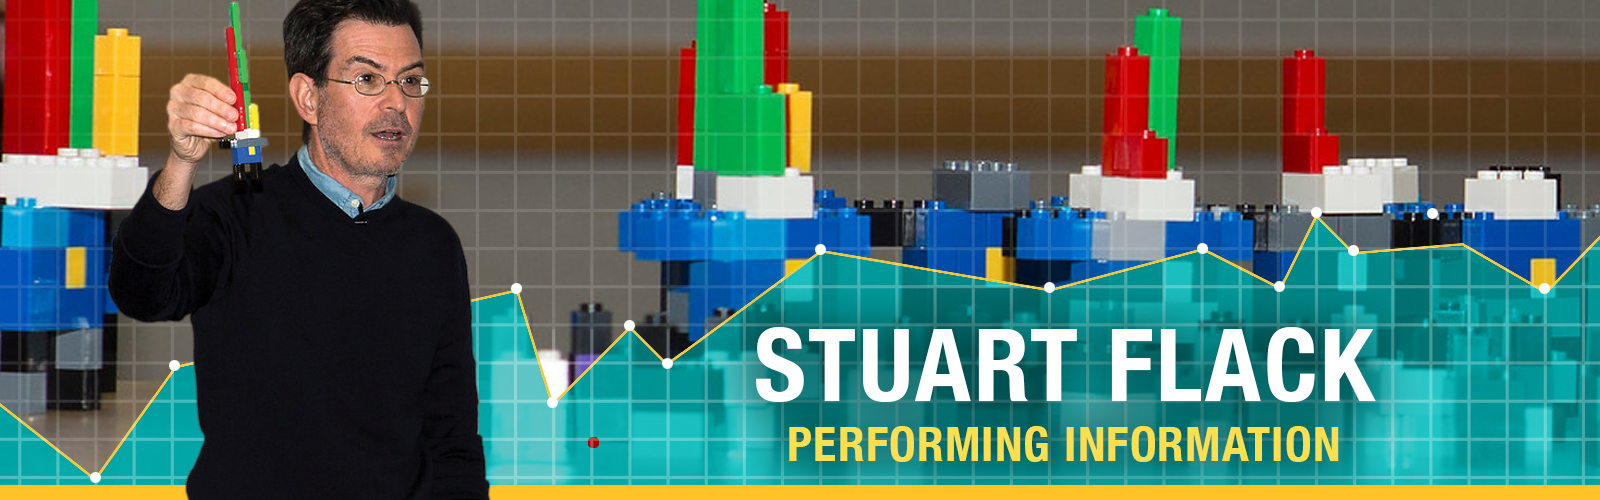 Stuart Flack: Performing Information header